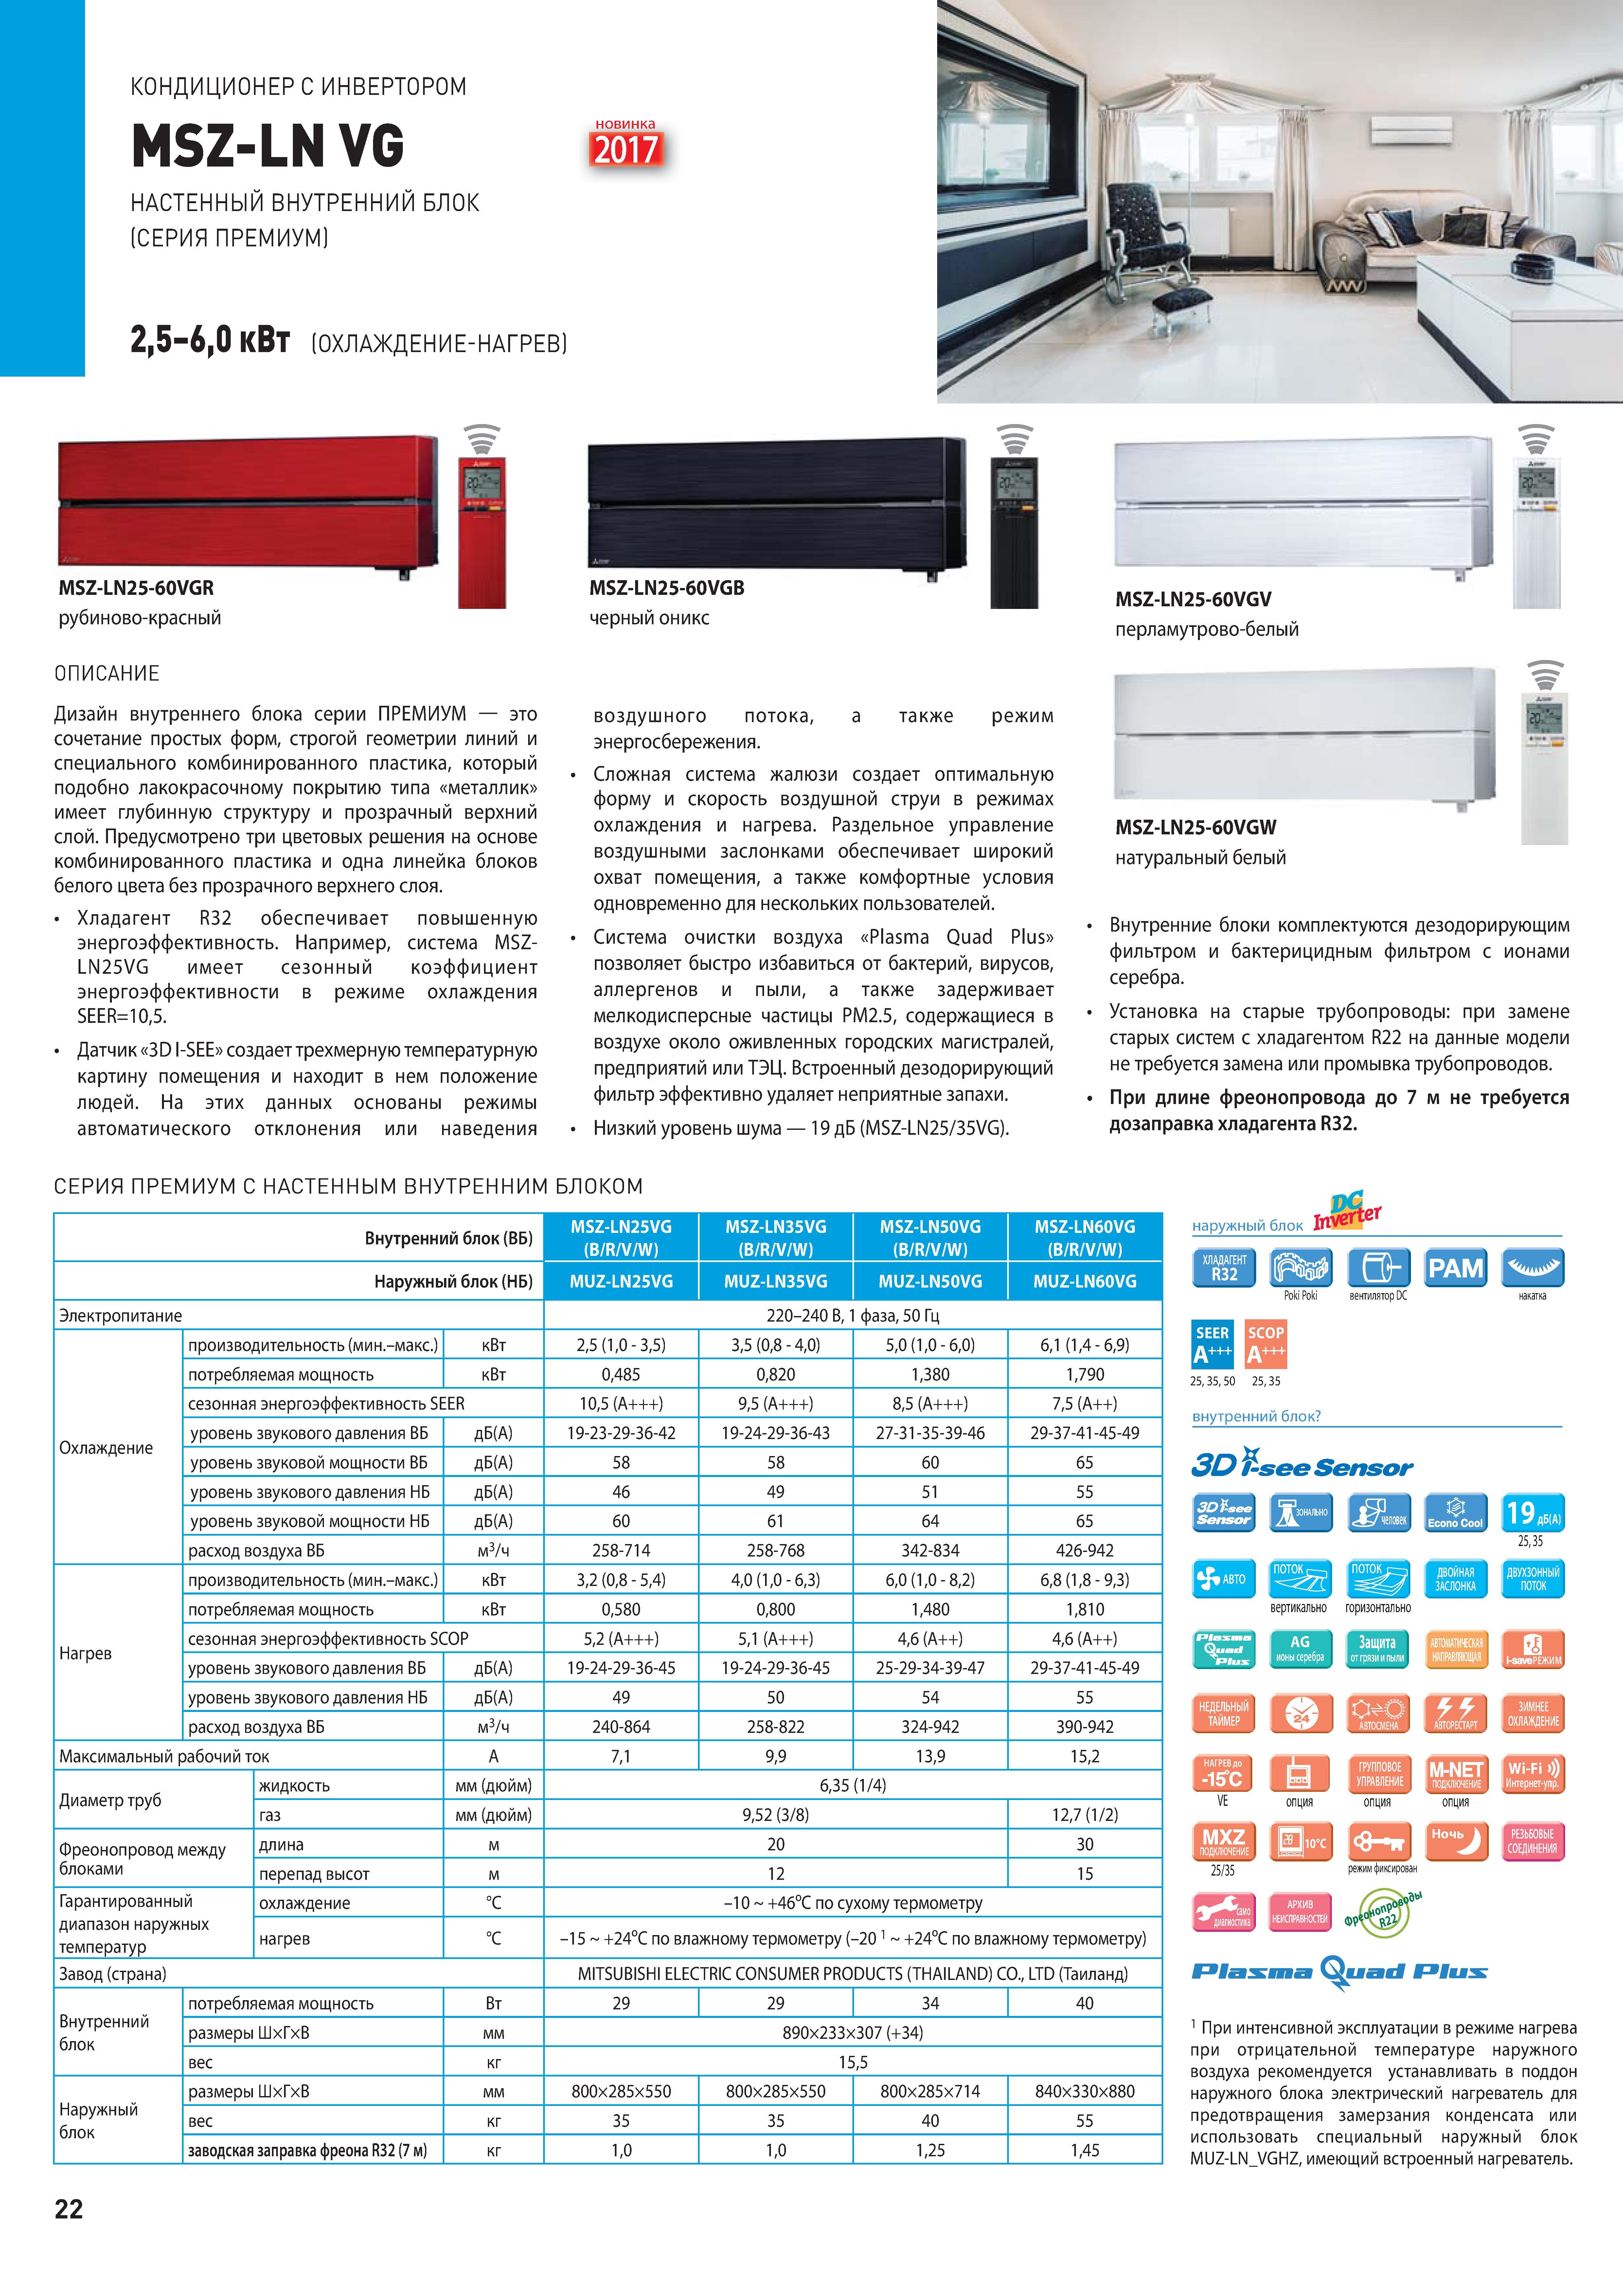 Характеристика кондиционеров mitsubishi electric